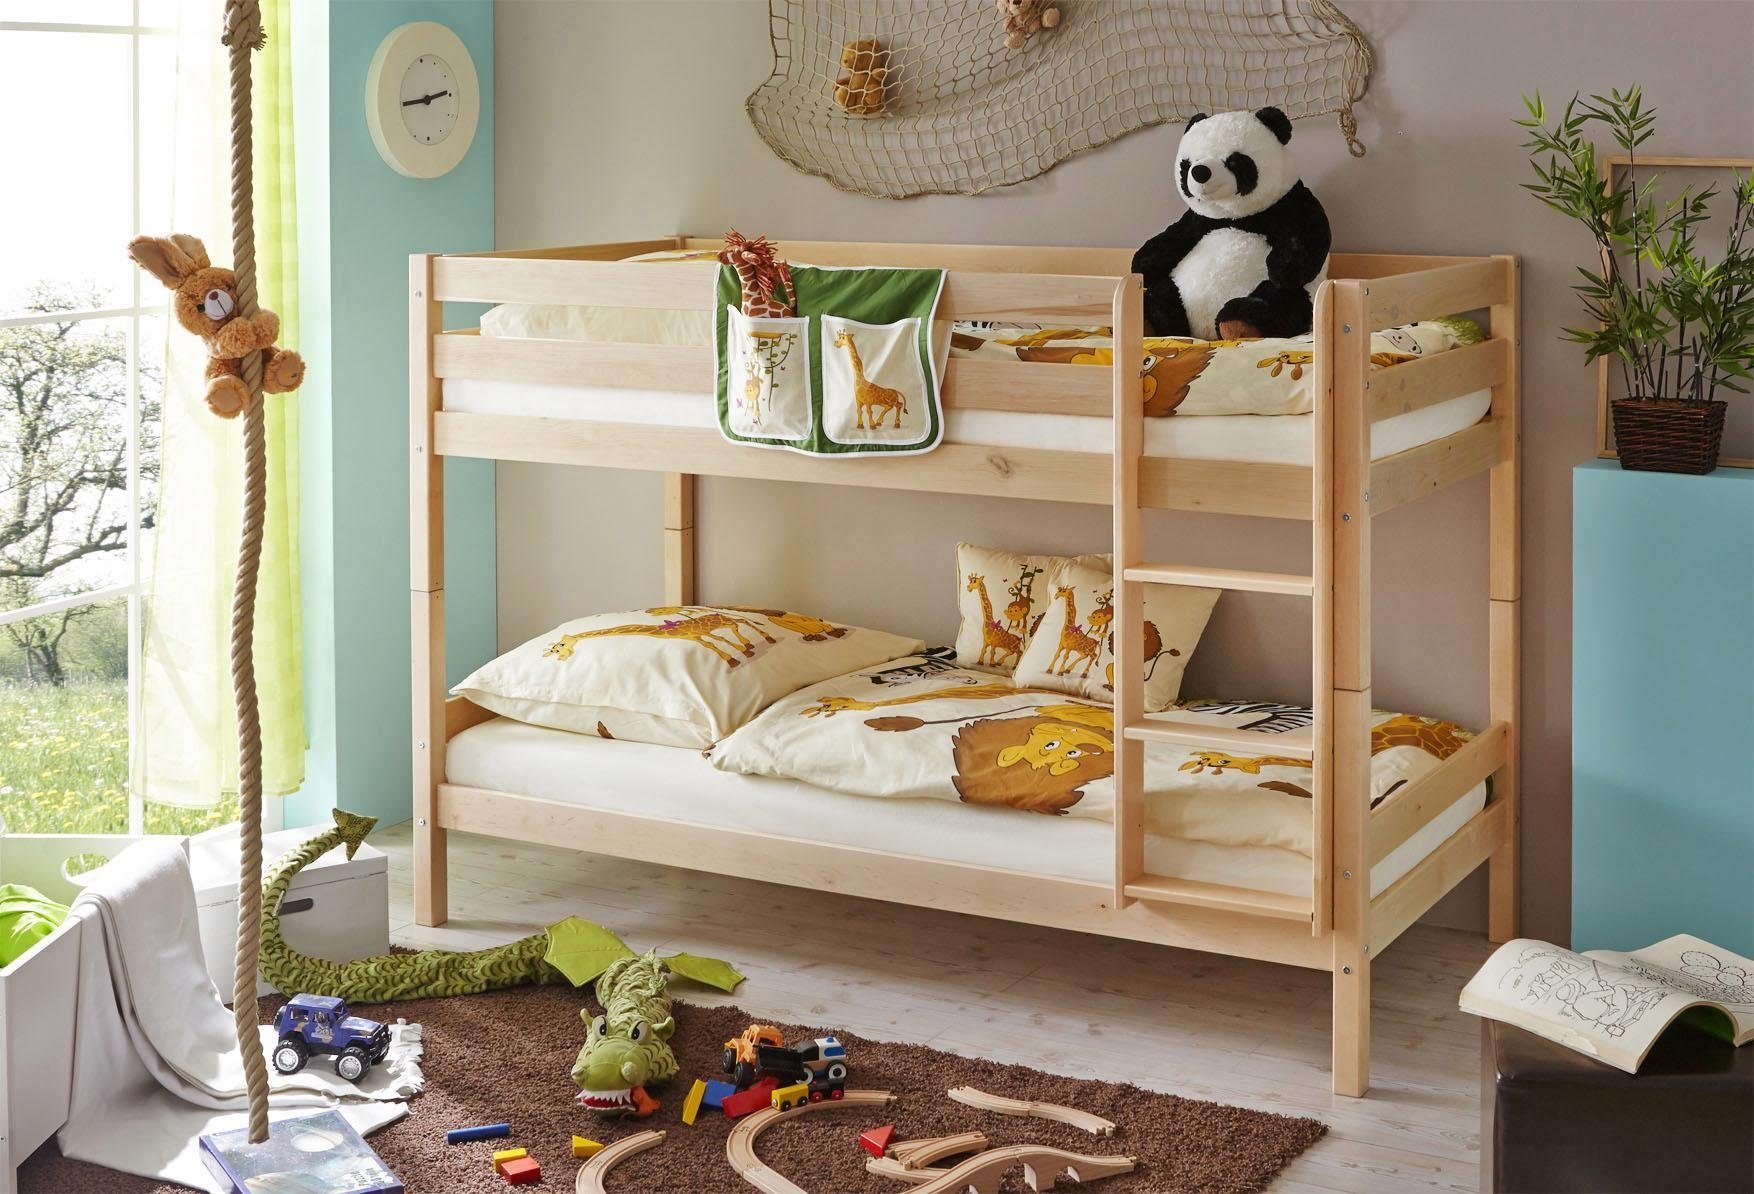 Etagenbett Rino : Weies etagenbett cool seaside oliver furniture wei